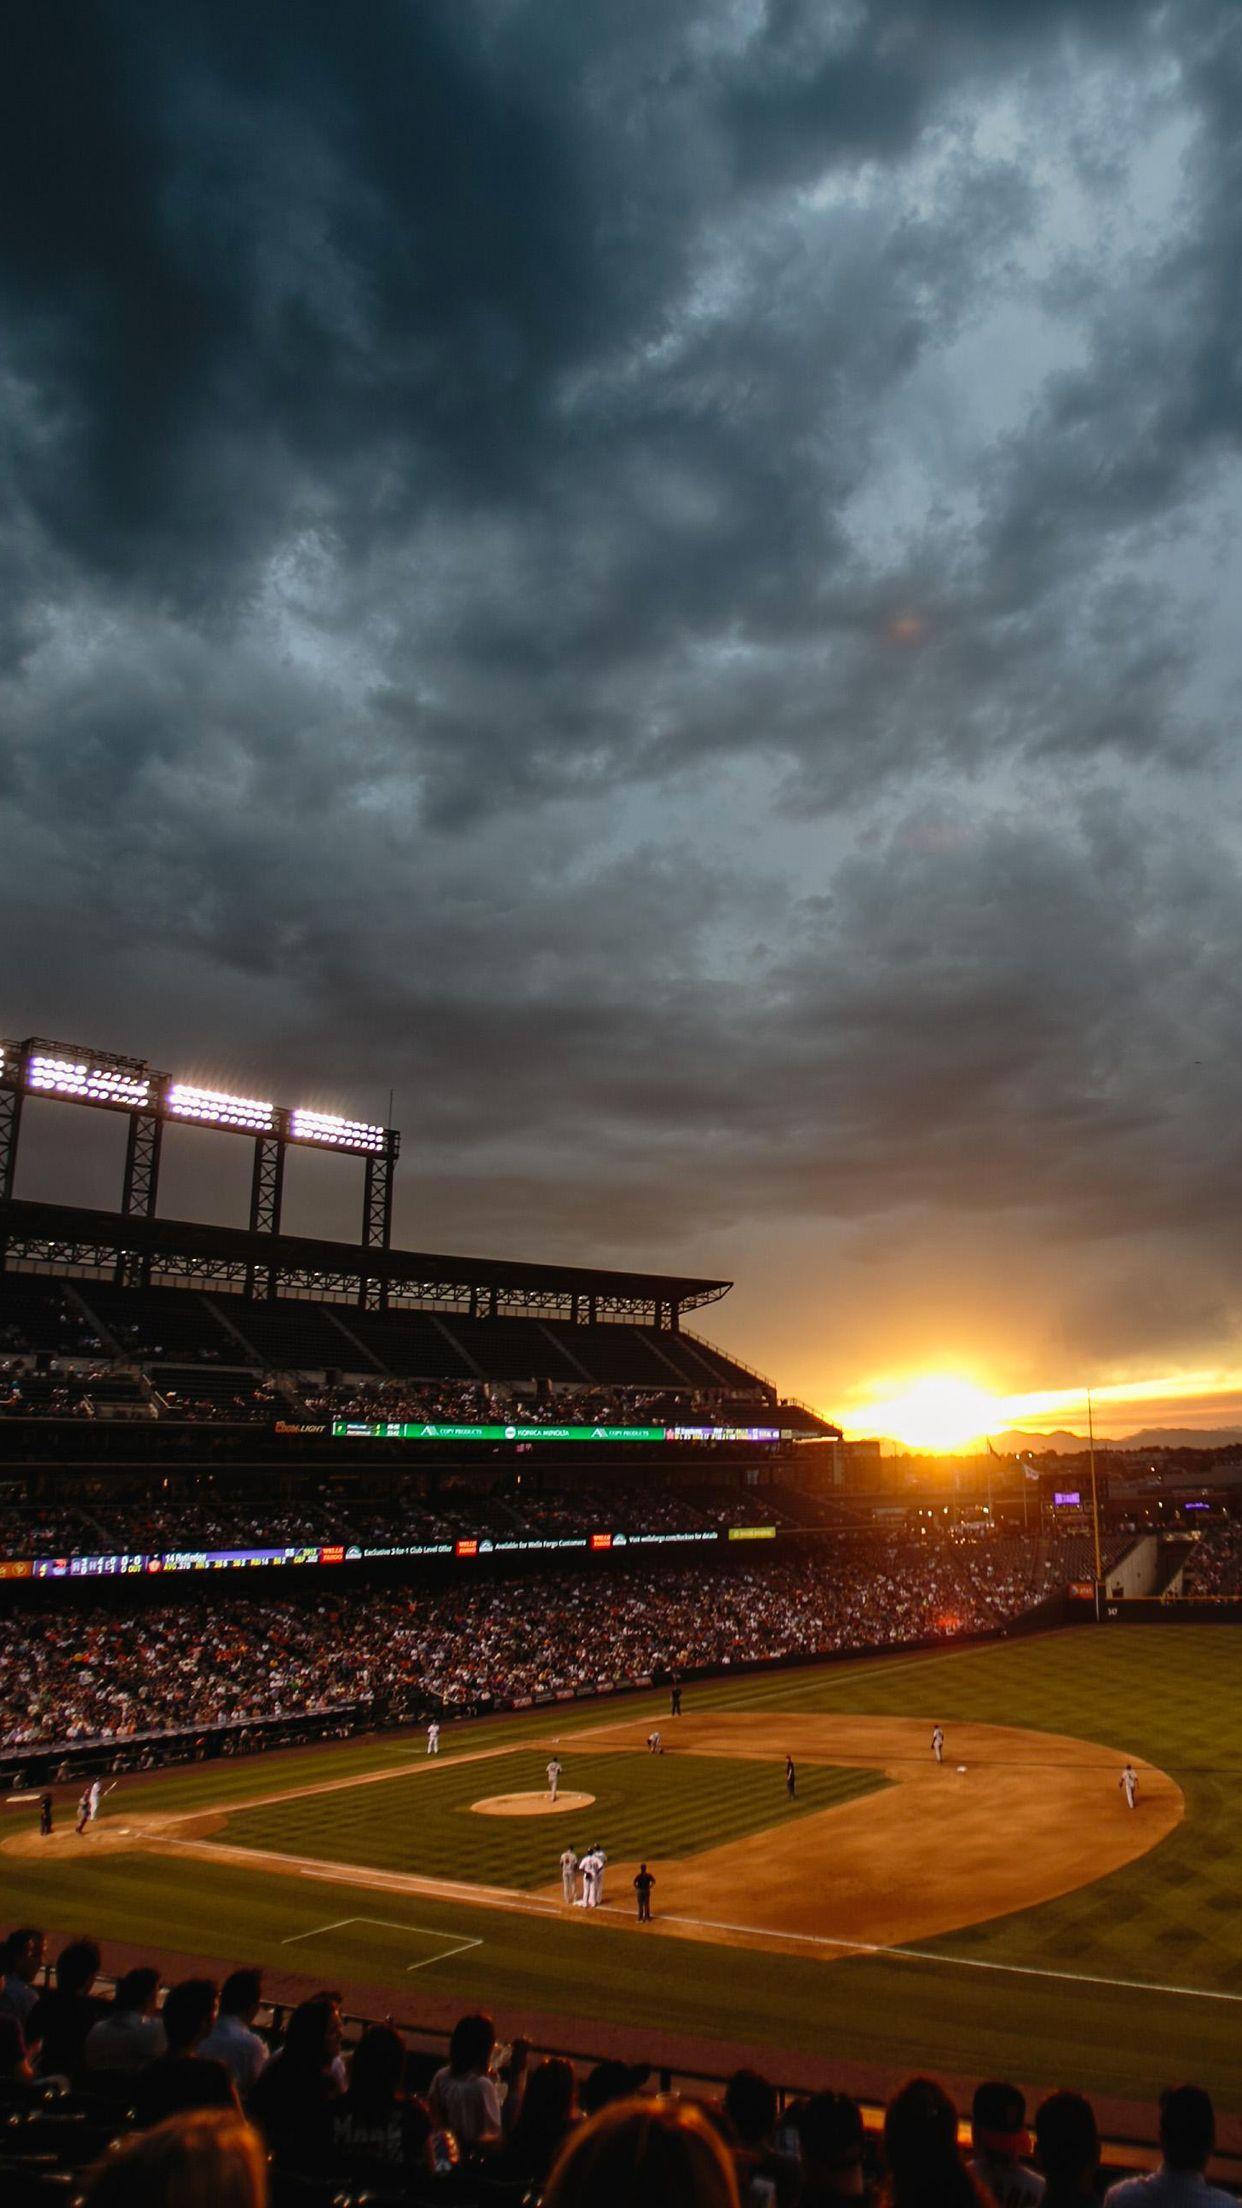 Free Download Baseball Wallpaper Hd Iphone Baseballmatch Baseball Wallpaper Baseball Photography Dodgers Baseball